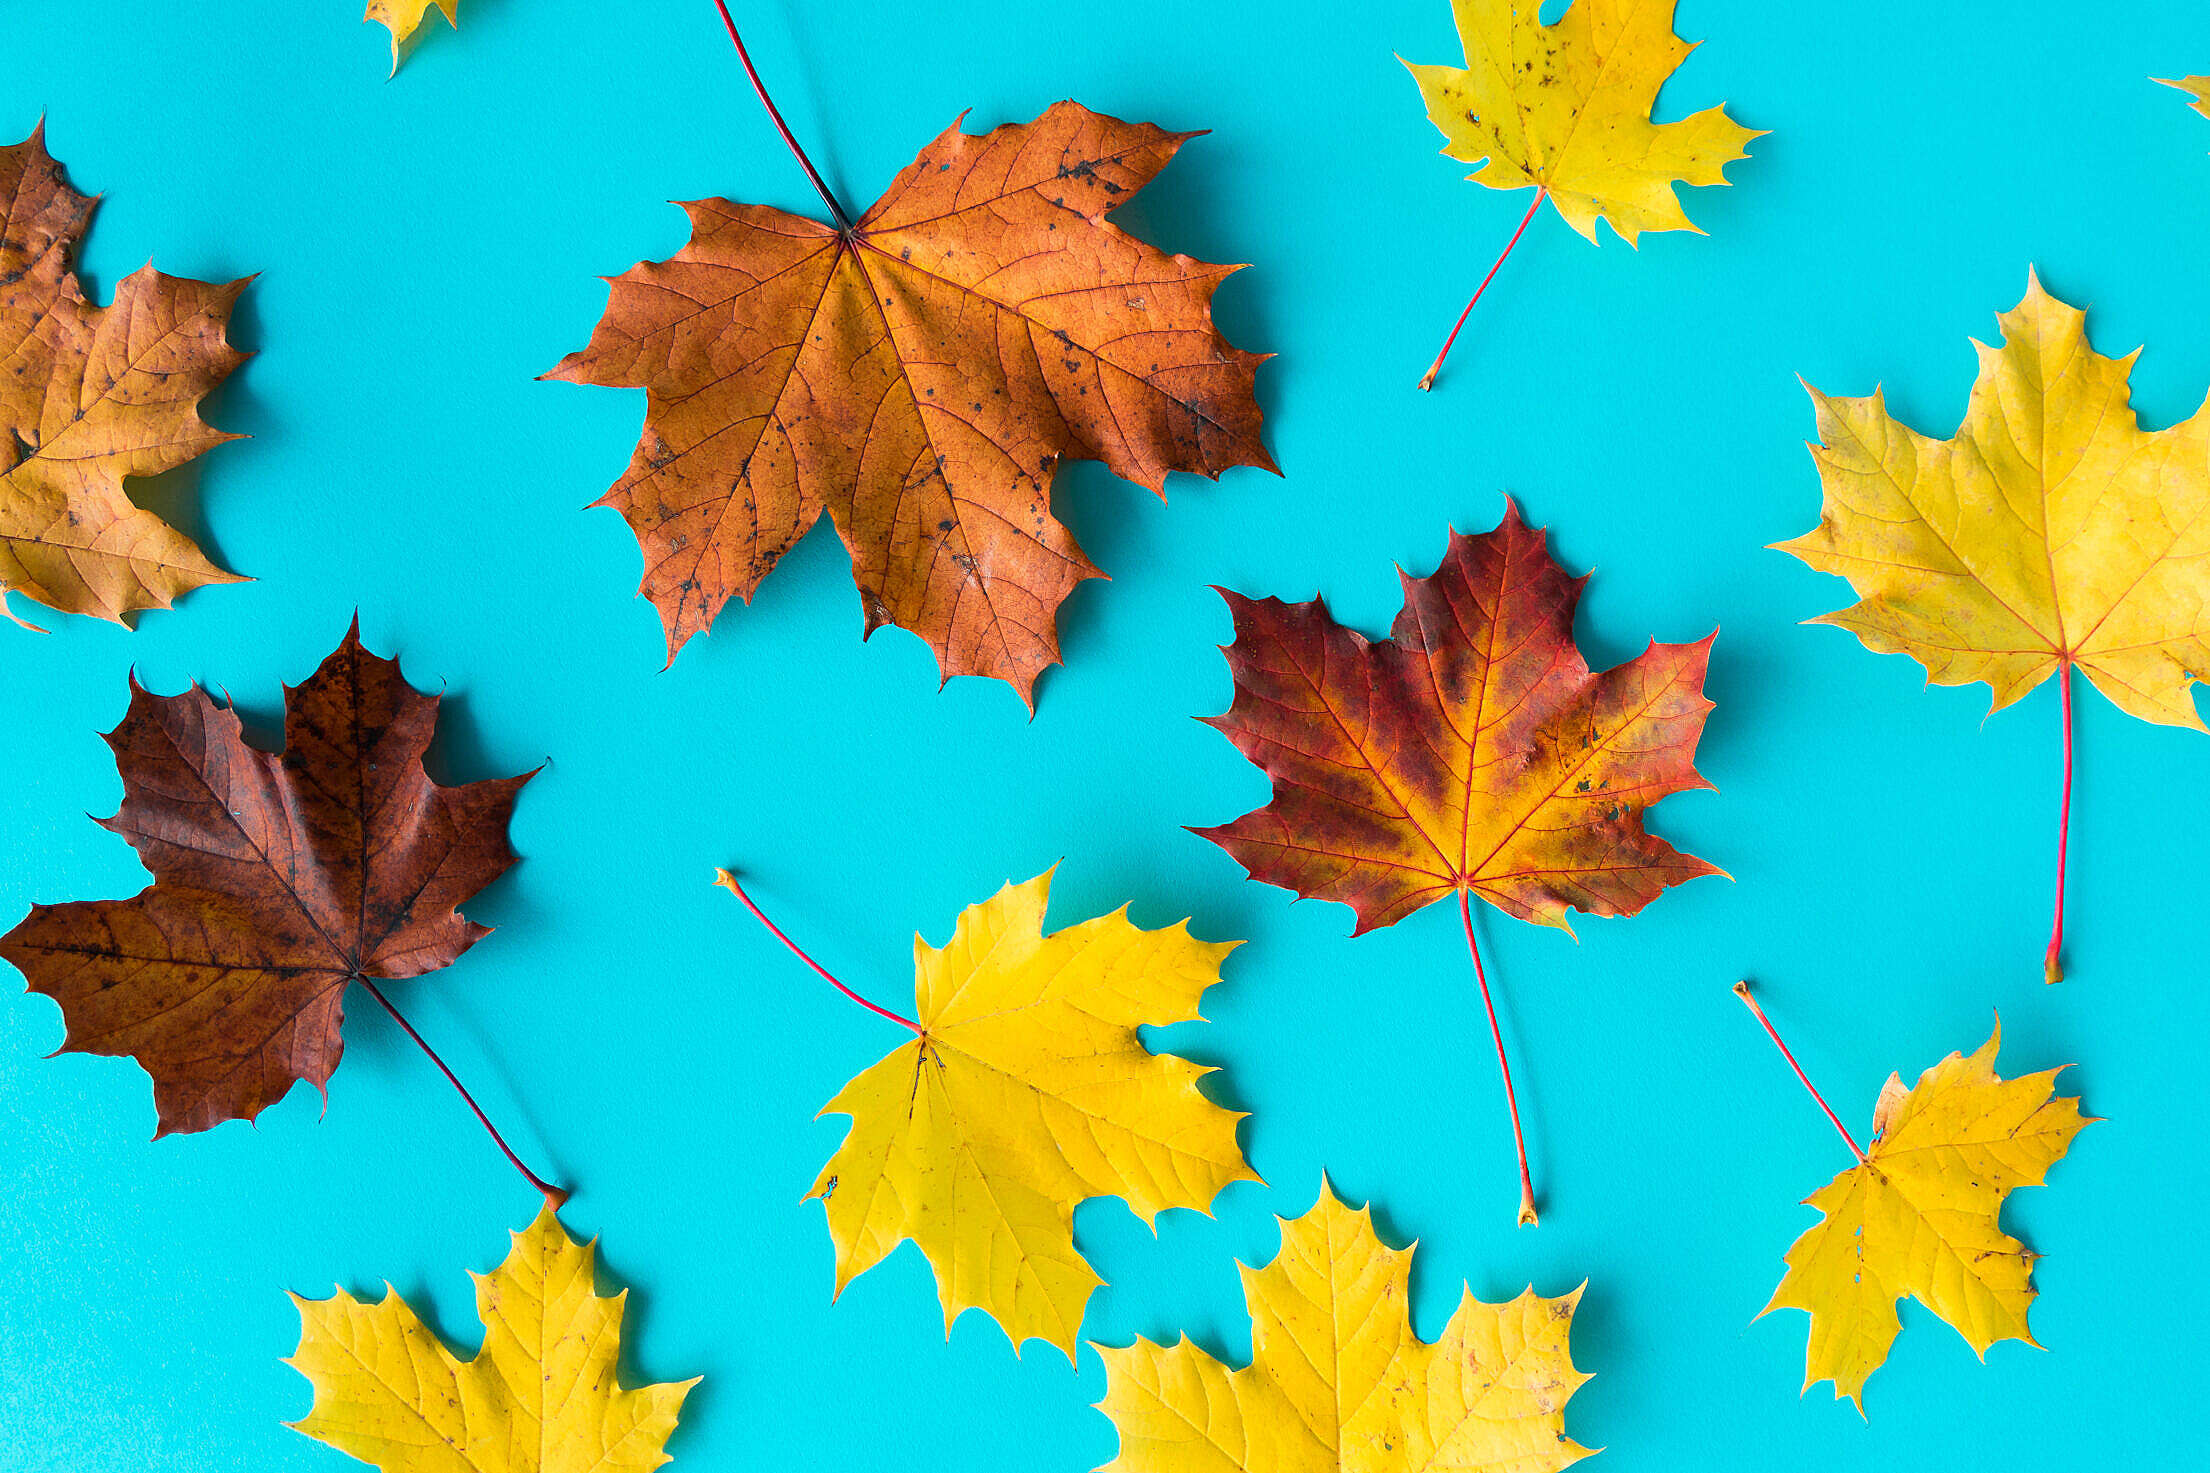 Autumn Leaves on Flat Blue Background Free Stock Photo